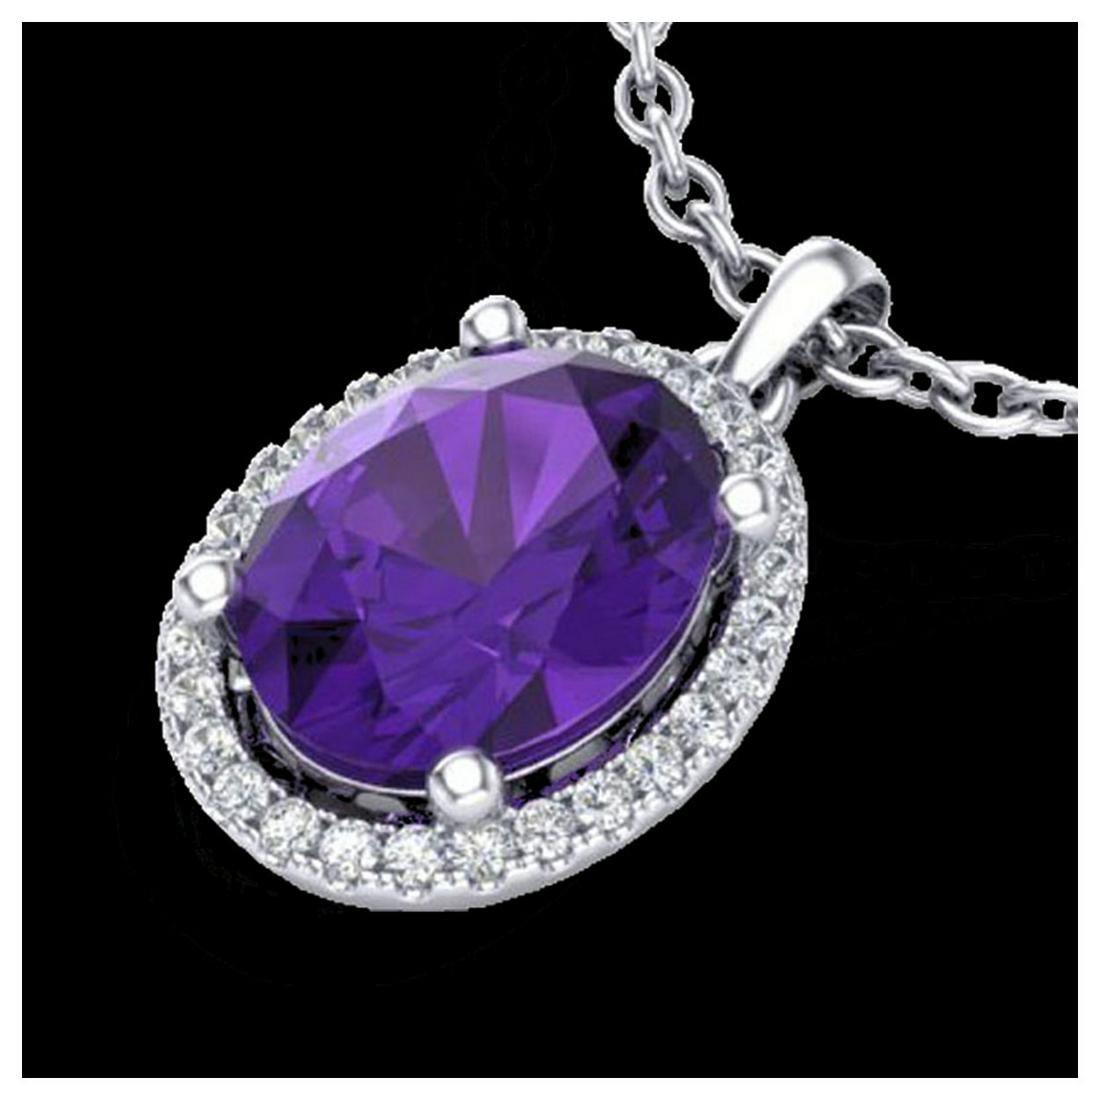 2.50 ctw Amethyst & VS/SI Diamond Necklace 18K White